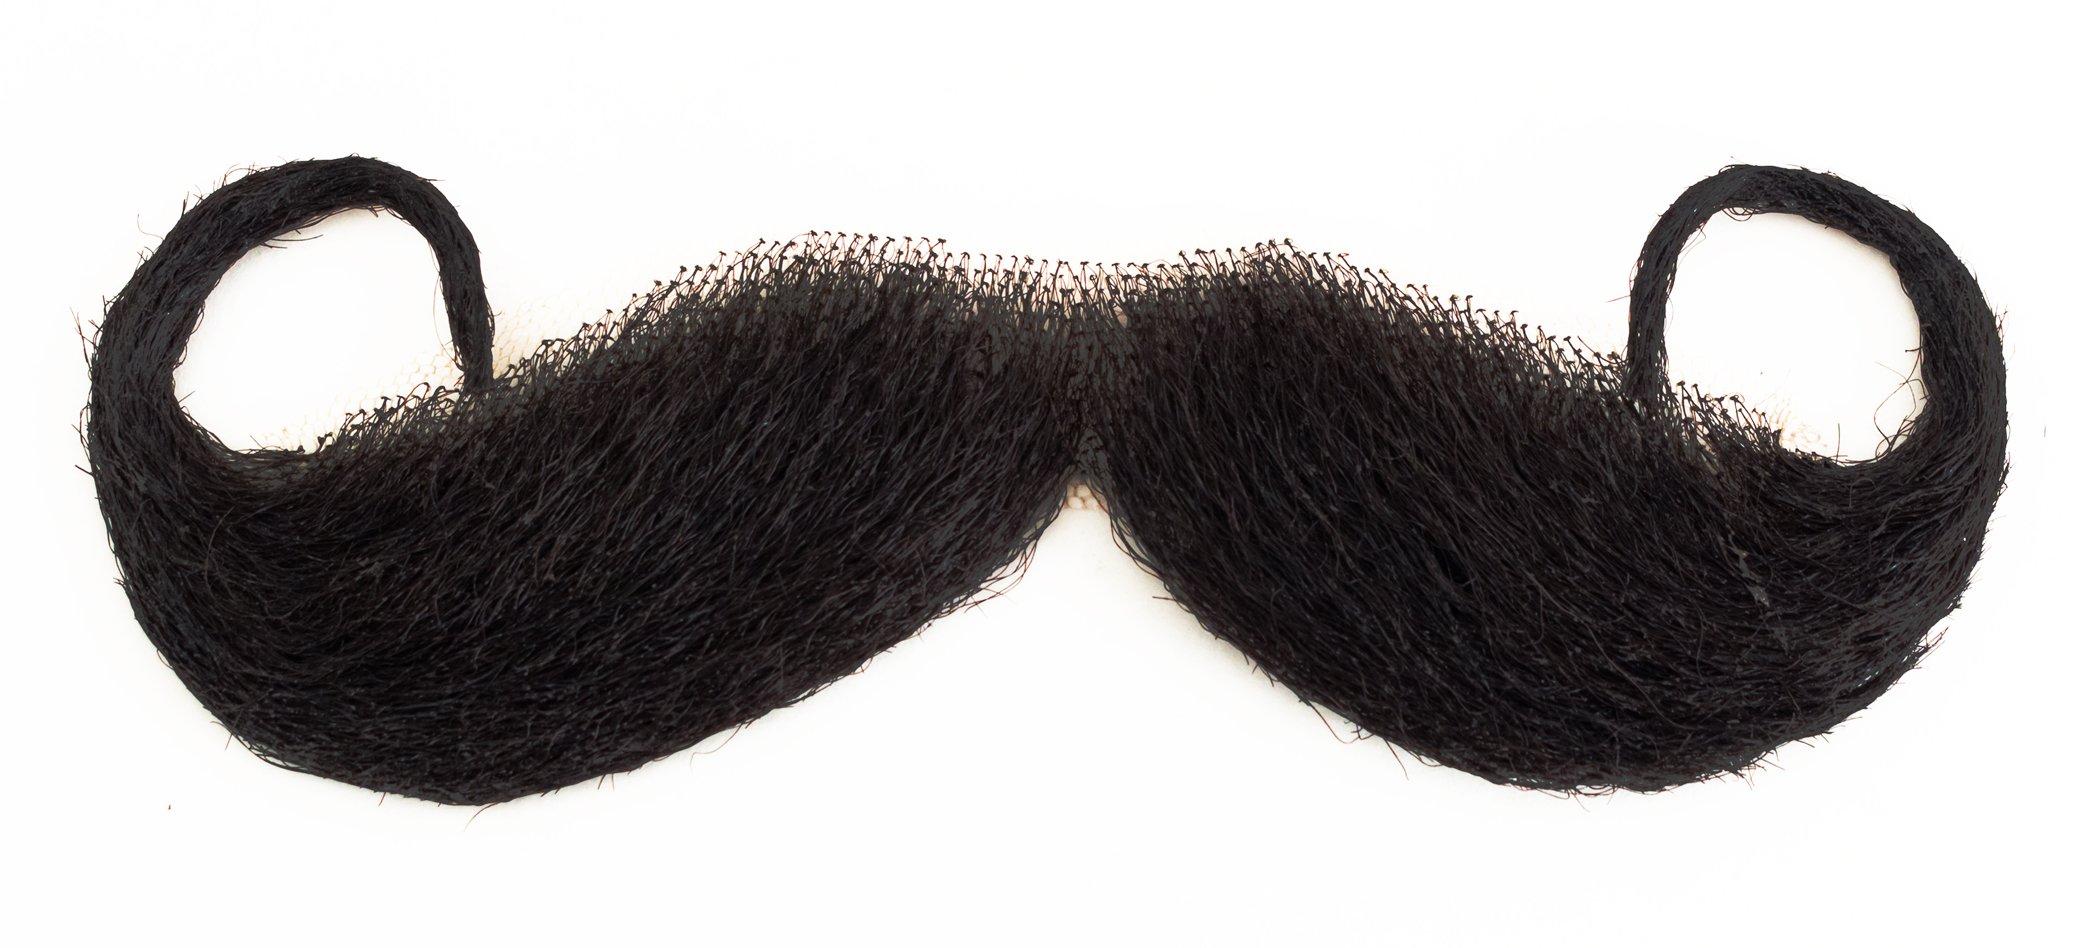 Star Power Real Human Hair Handlebar Moustache, Black, One Size